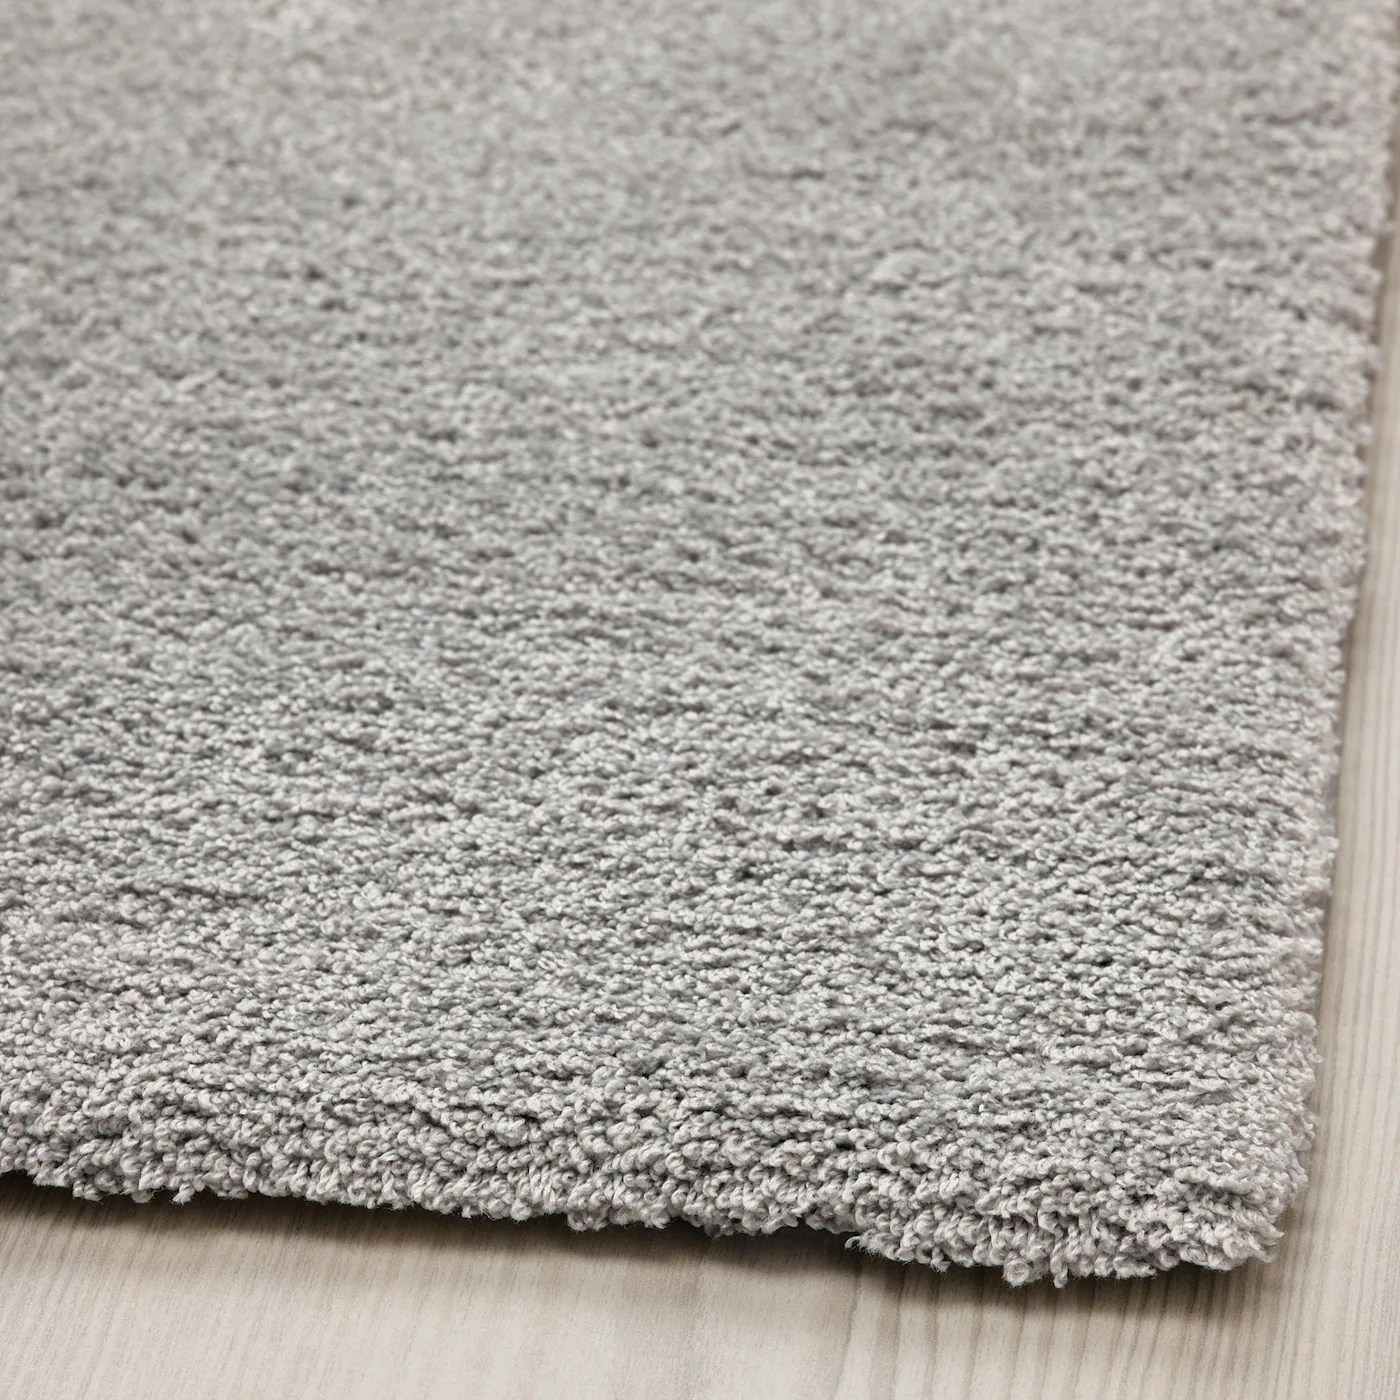 knardrup tapis poils ras gris clair 160x230 cm